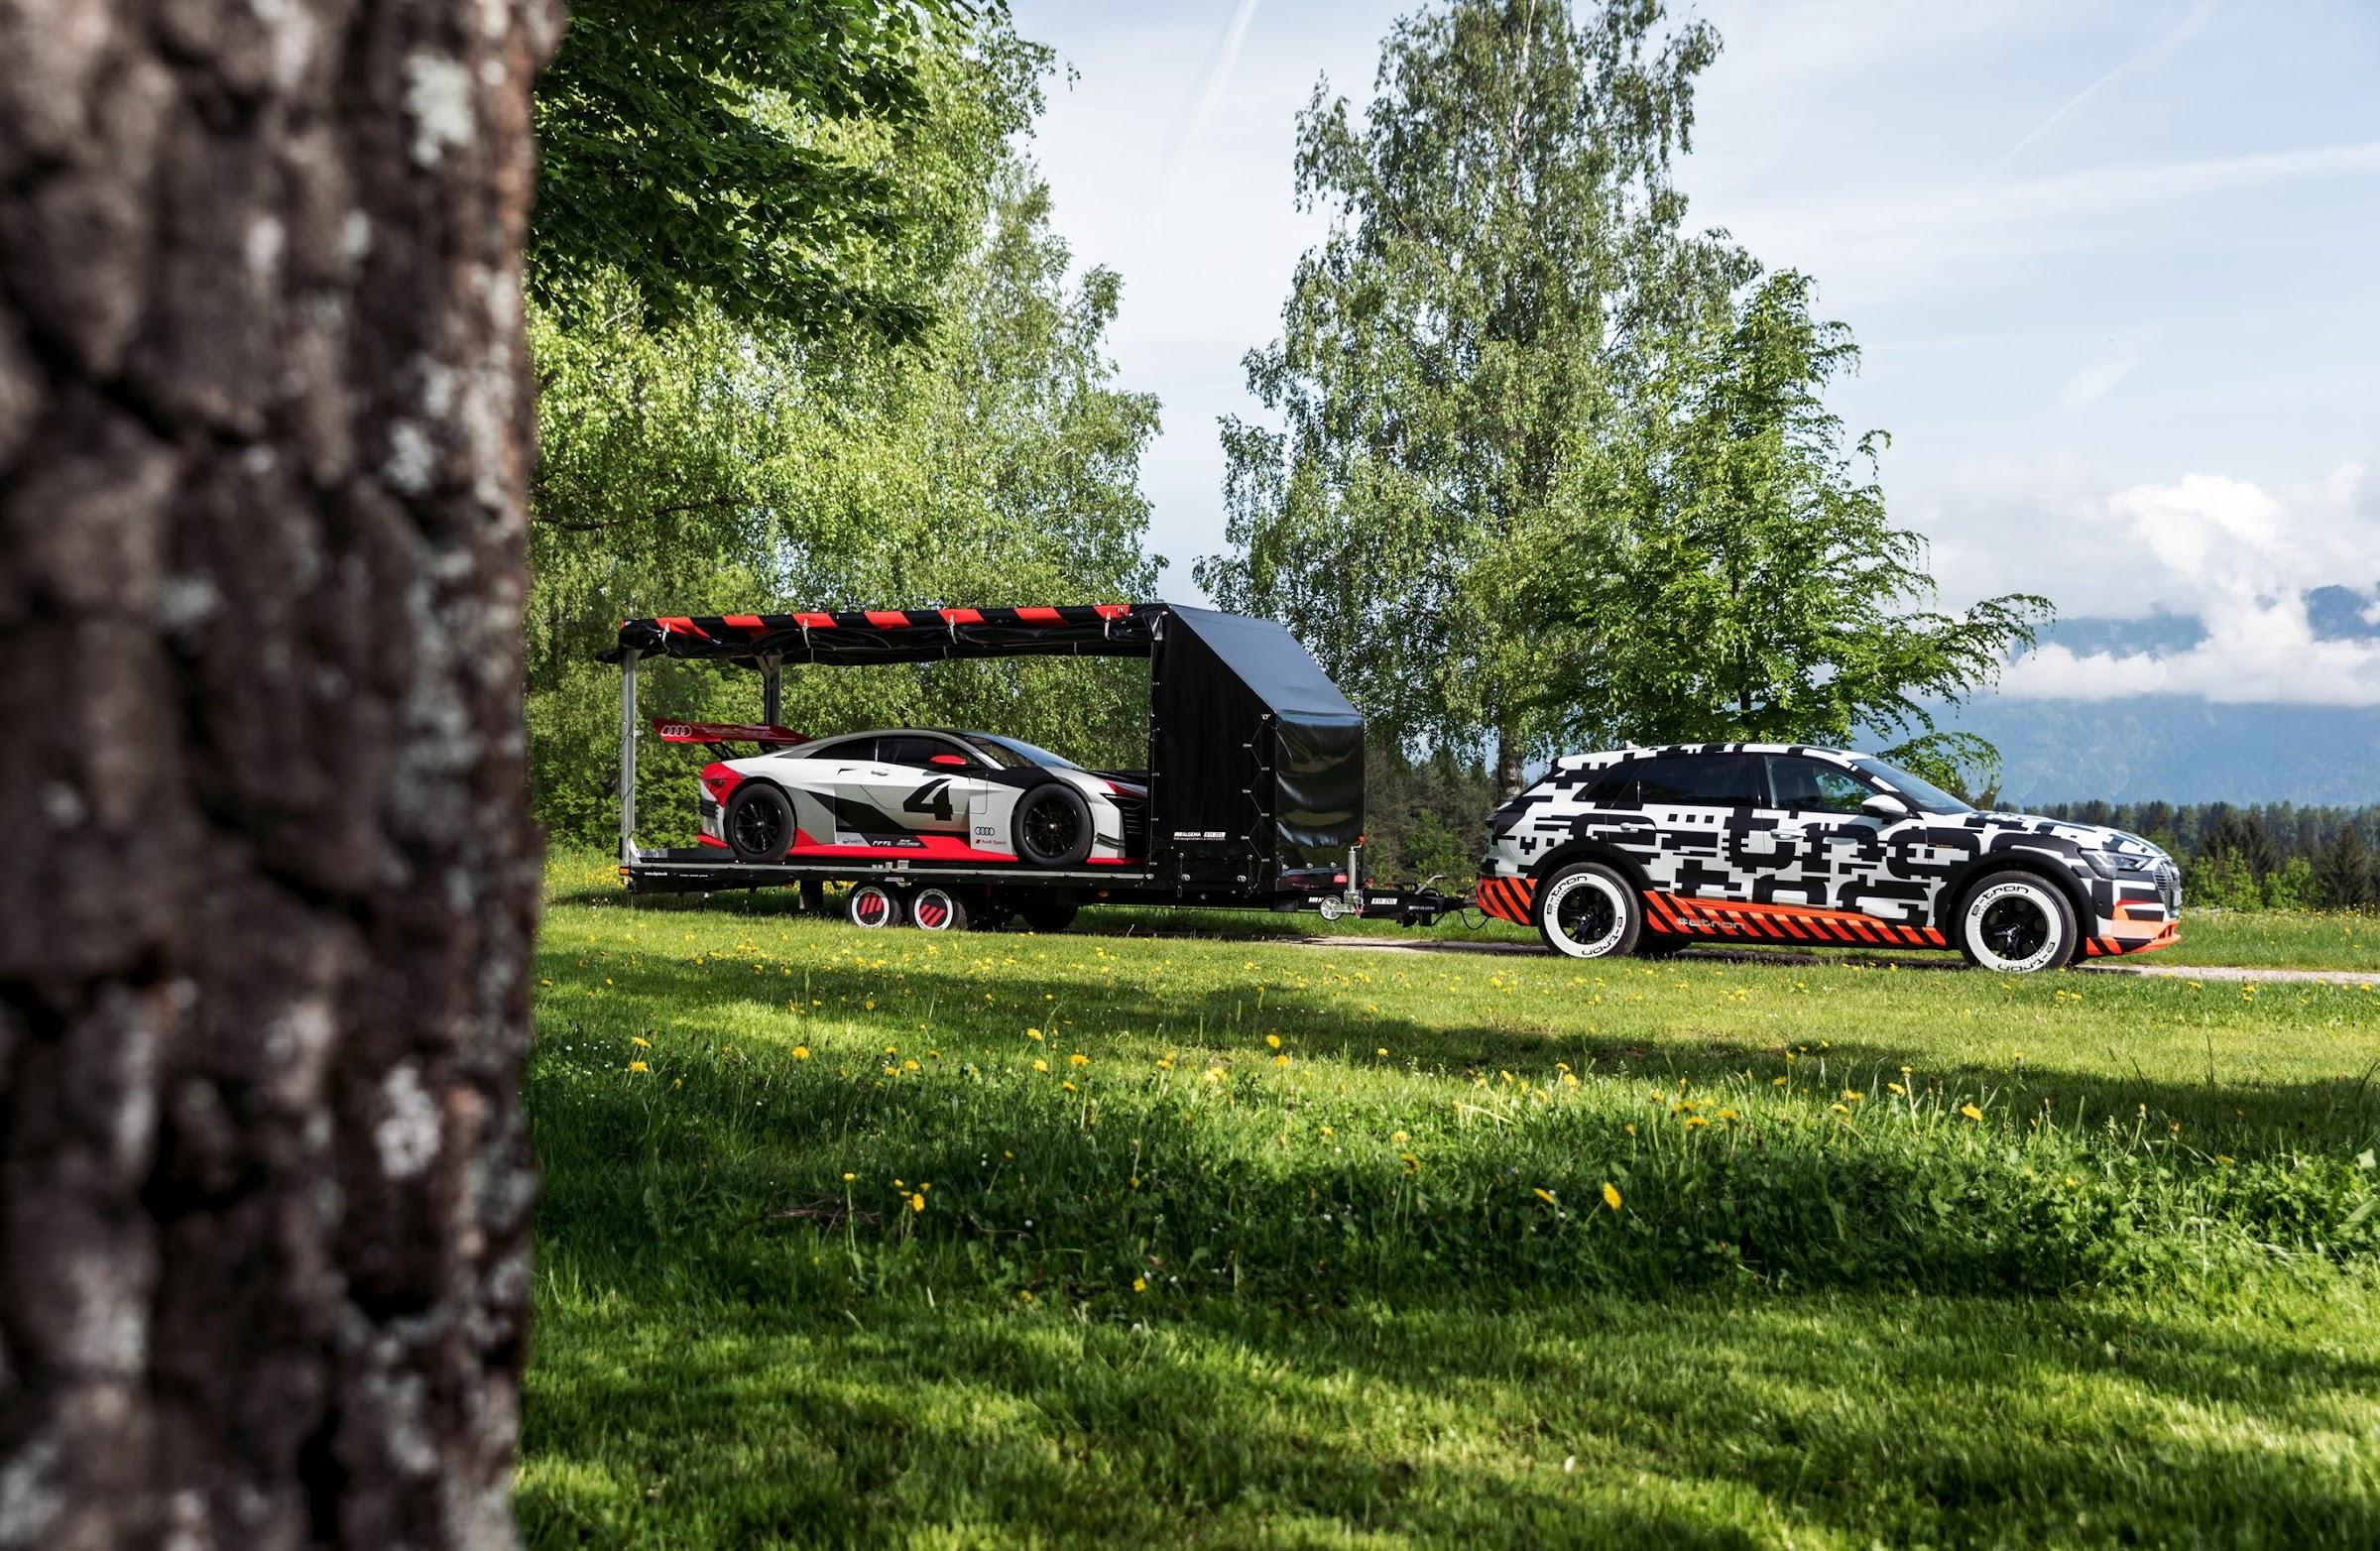 O A16eSz6ROCLhvK8dGX cLk xAQdt0hQ5ytwuiBQmzZA4SIkfEd4YnMykpEGYqApcIm9pmqrAPUX9Q8PLCq8NouM16fy2yoNT9CIEH7CnjL7dasce3xbhtkq16kZtbjjHEHz4dD1A=w2400 - Audi quiere electrizar la GTI Meet 2018